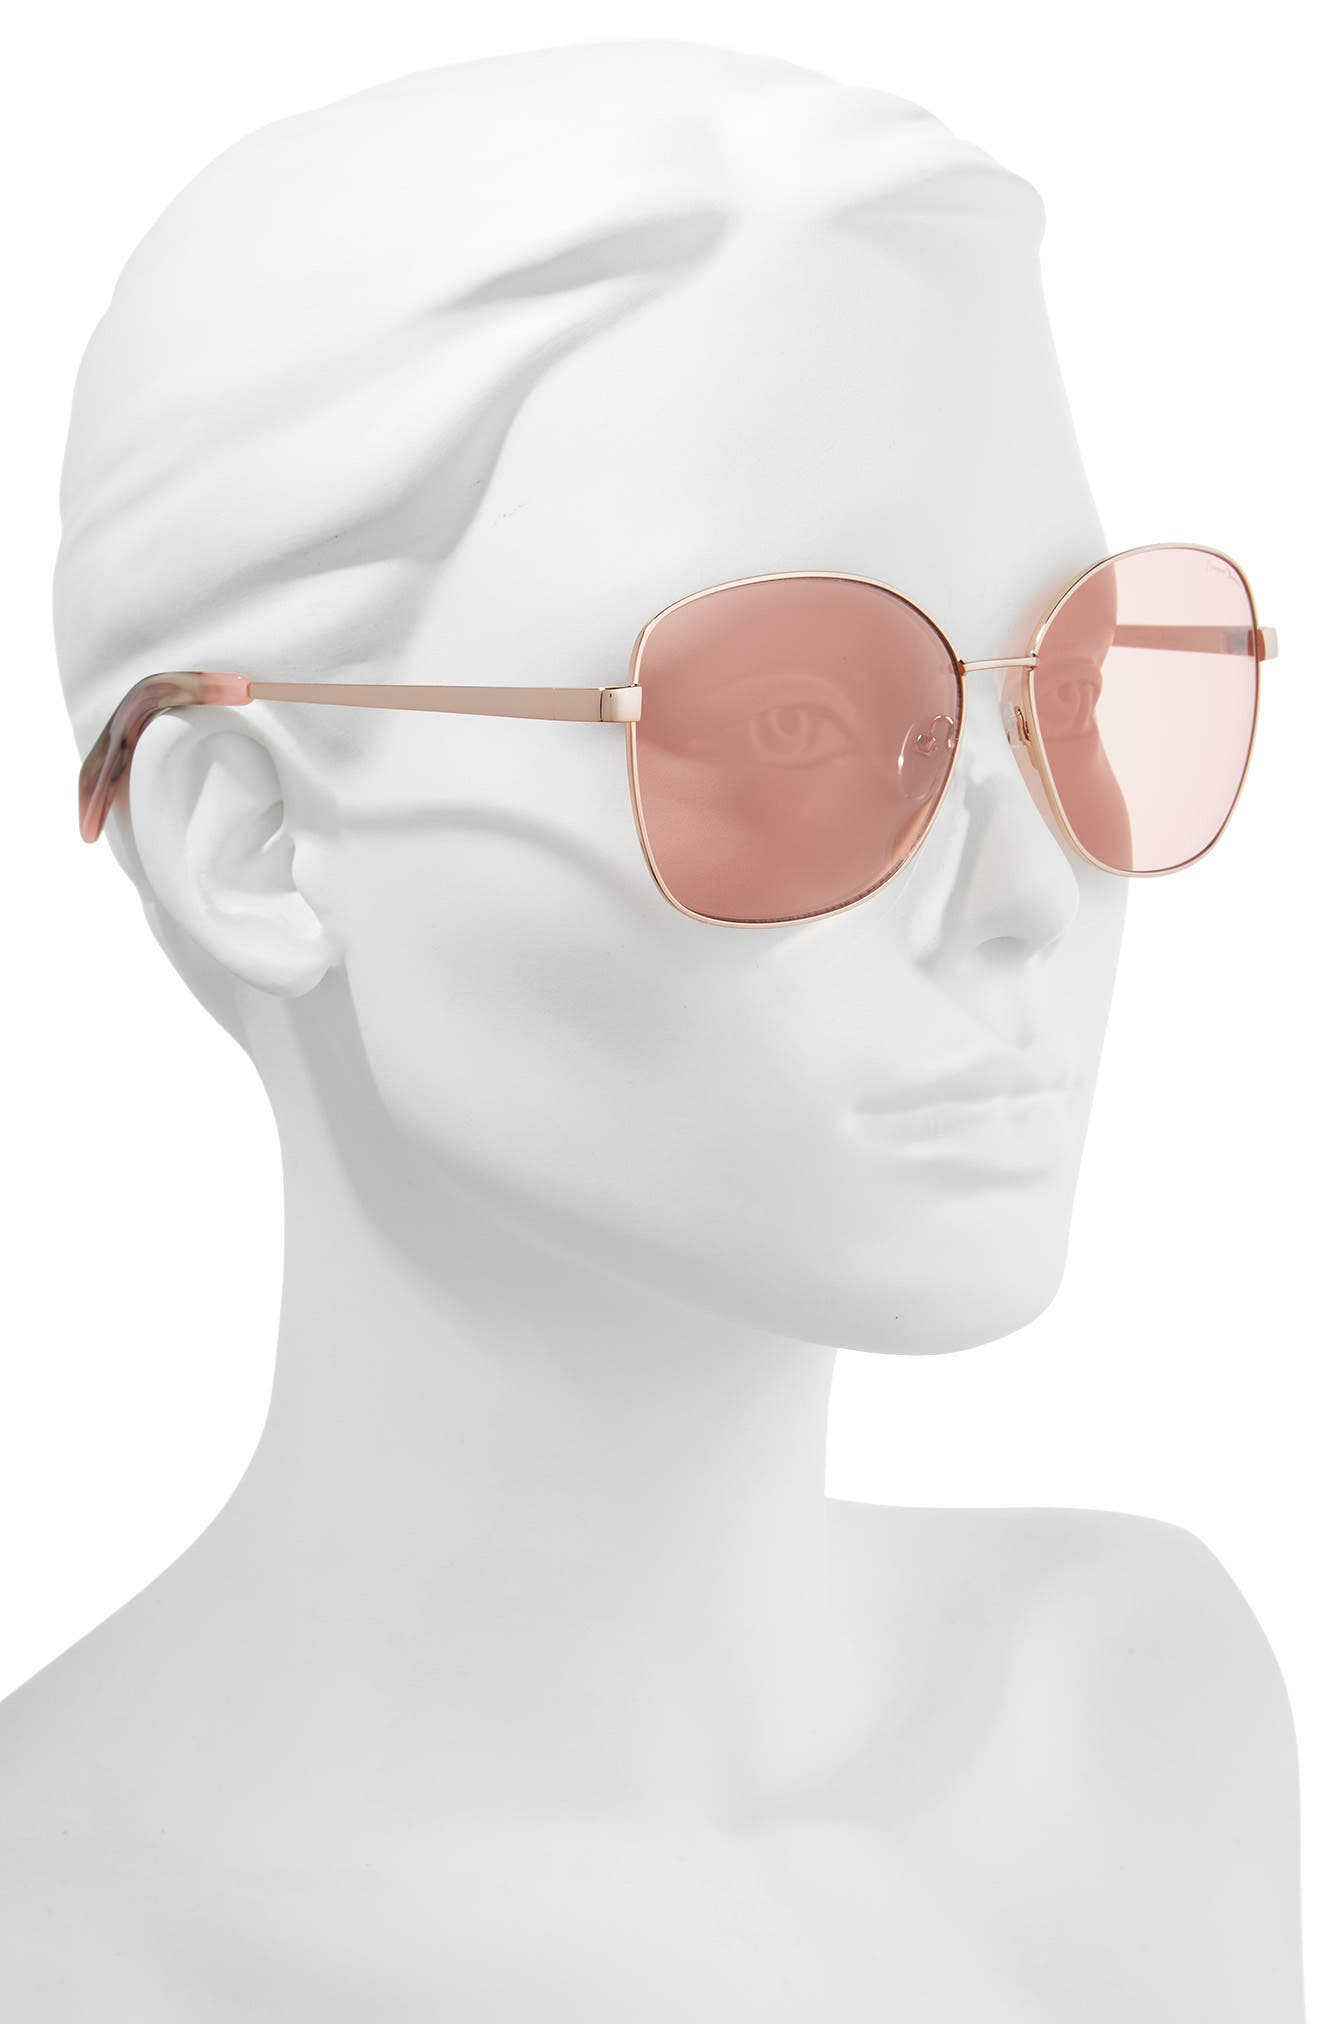 61mm Square Sunglasses,                             Alternate thumbnail 2, color,                             ROSE GOLD